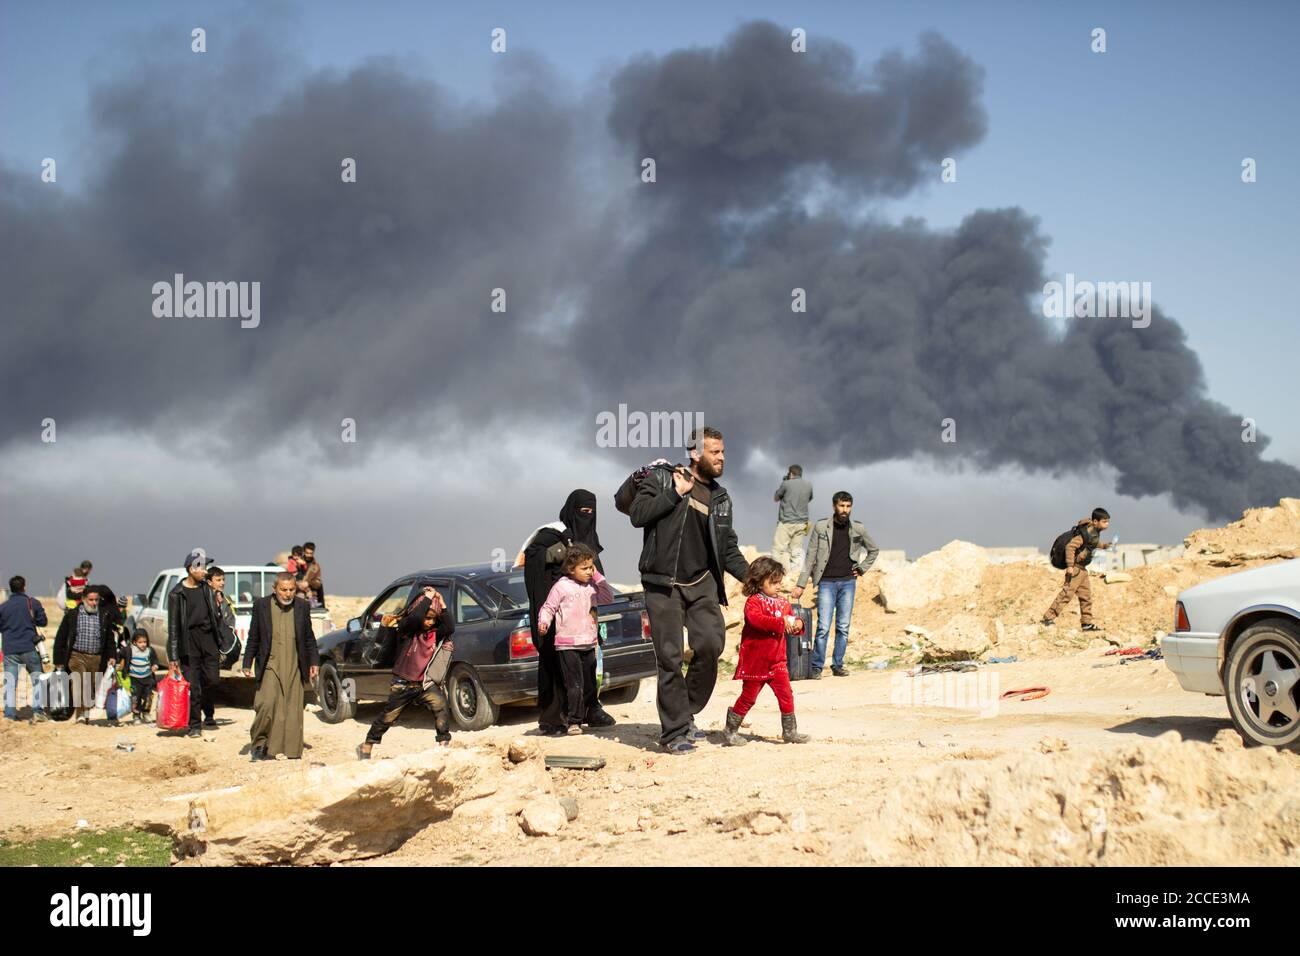 Mosul, Irak. 7 Mar 2017 civiles huyen de sus hogares cerca del barrio de Tall ar Rayyan en Mosul Occidental. Crédito: Joven G. Kim Foto de stock